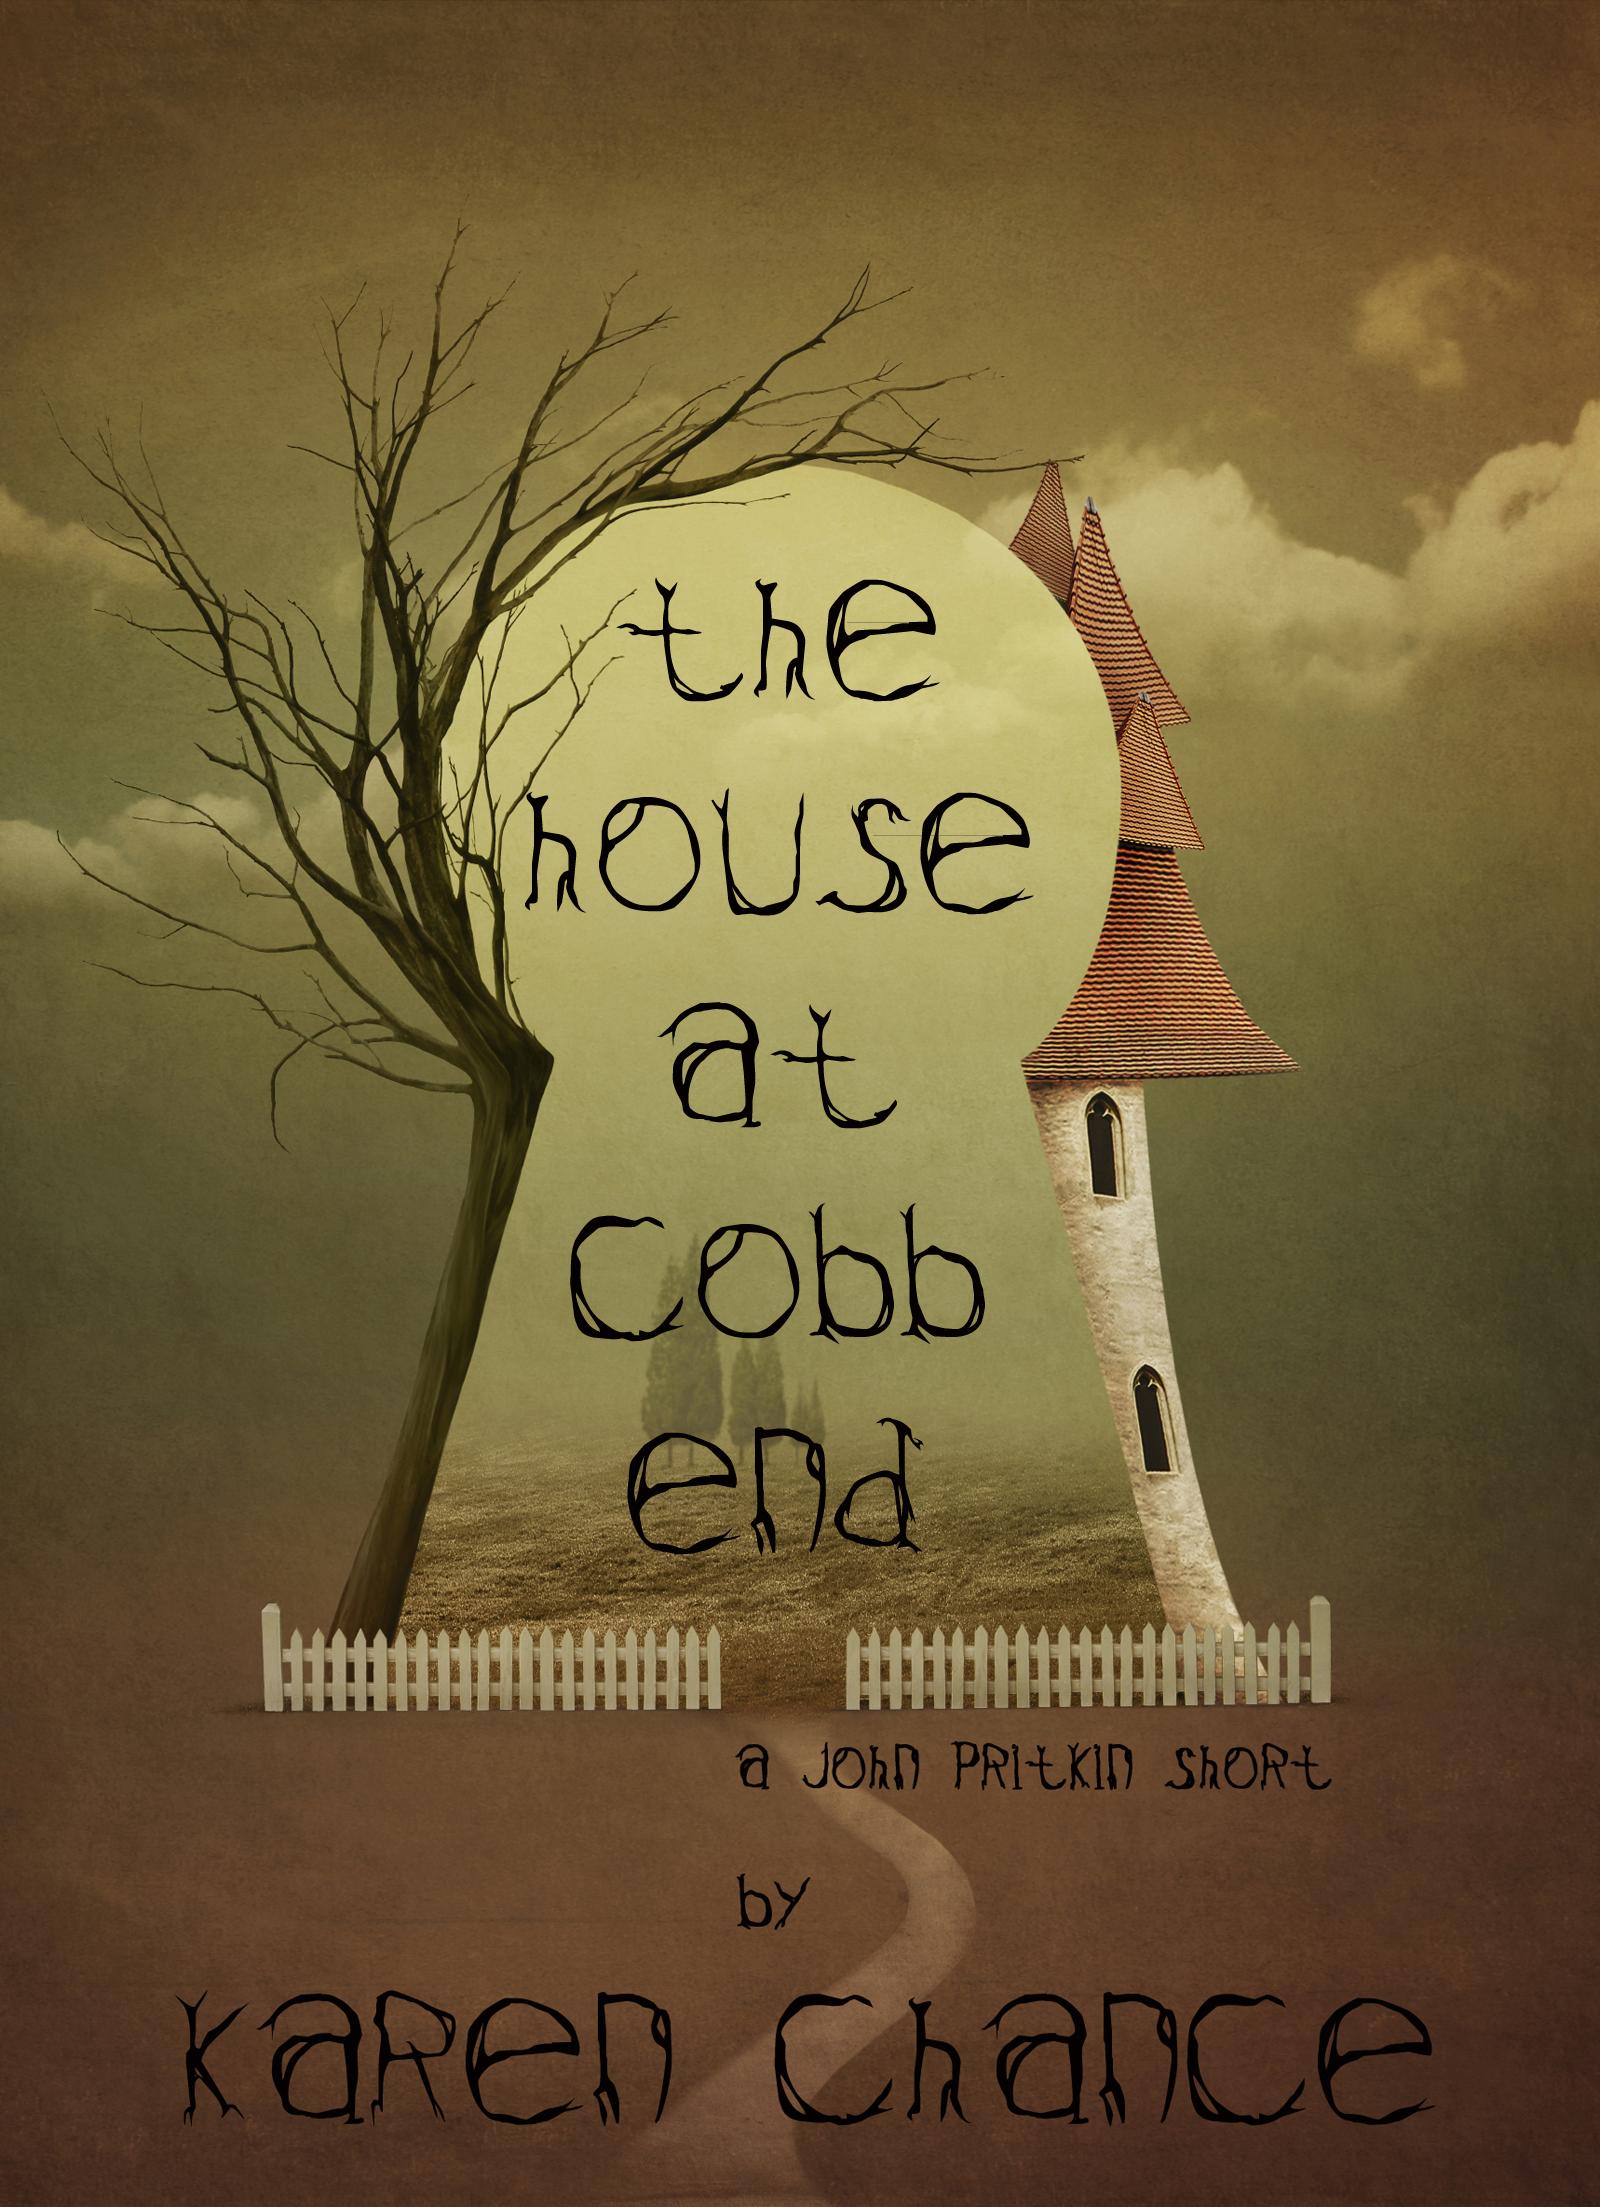 Karen Chance - The House at Cobb End